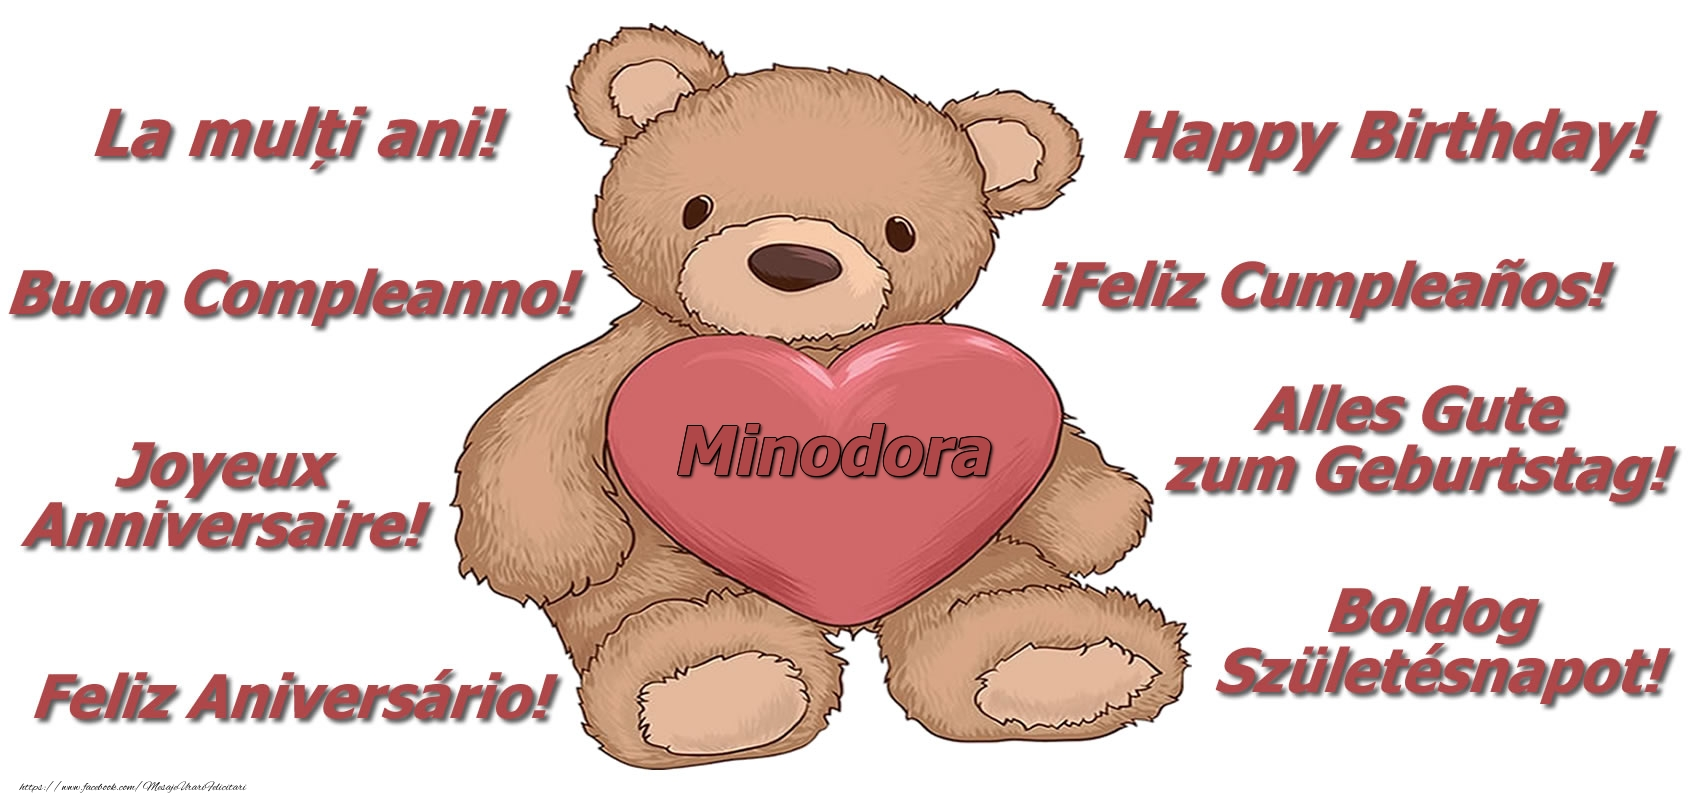 Felicitari de zi de nastere - La multi ani Minodora! - Ursulet